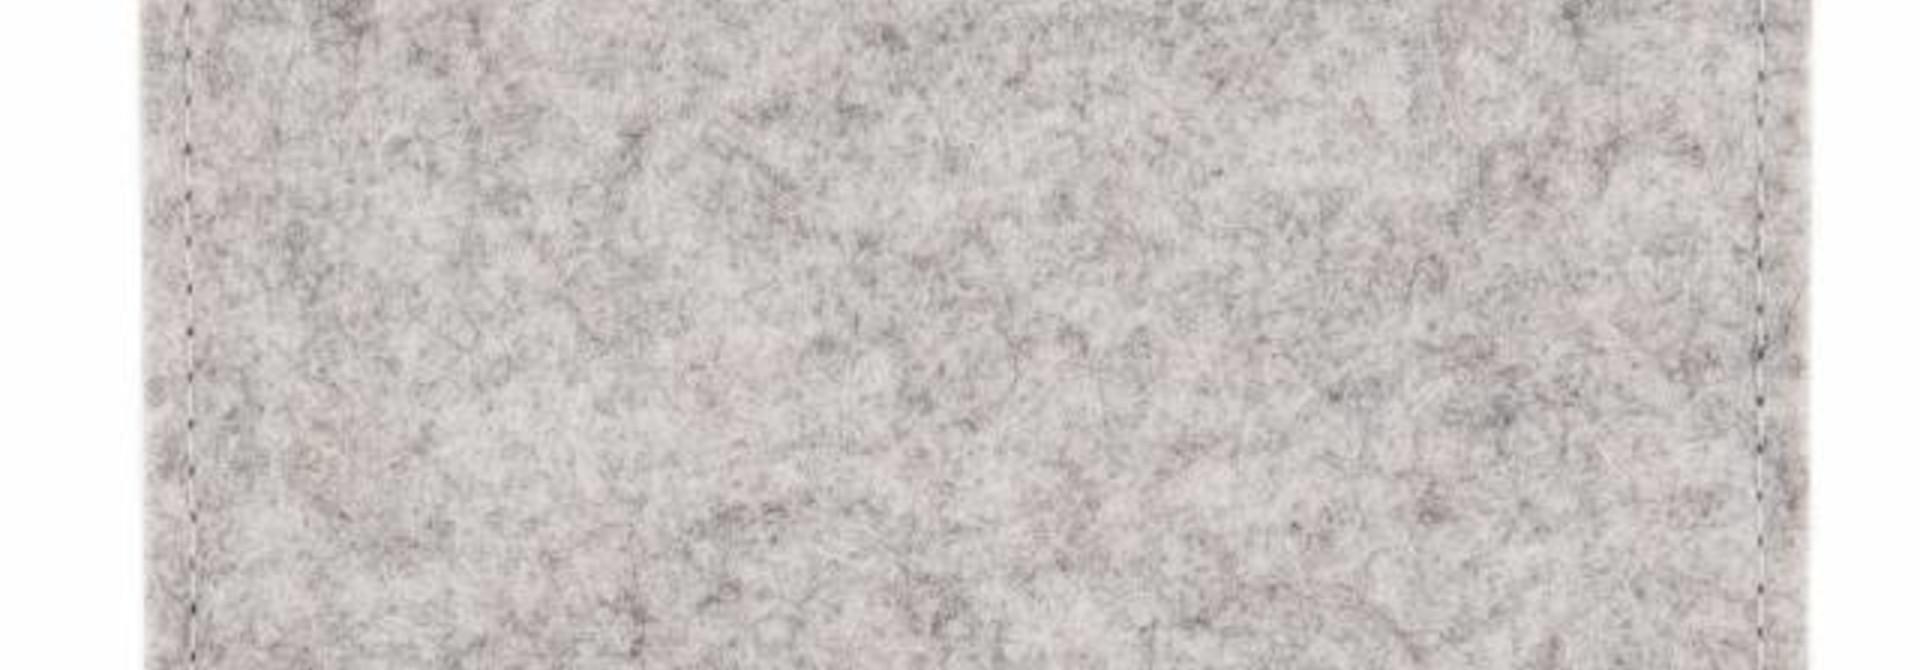 Swift / Spin Sleeve Hellgrau